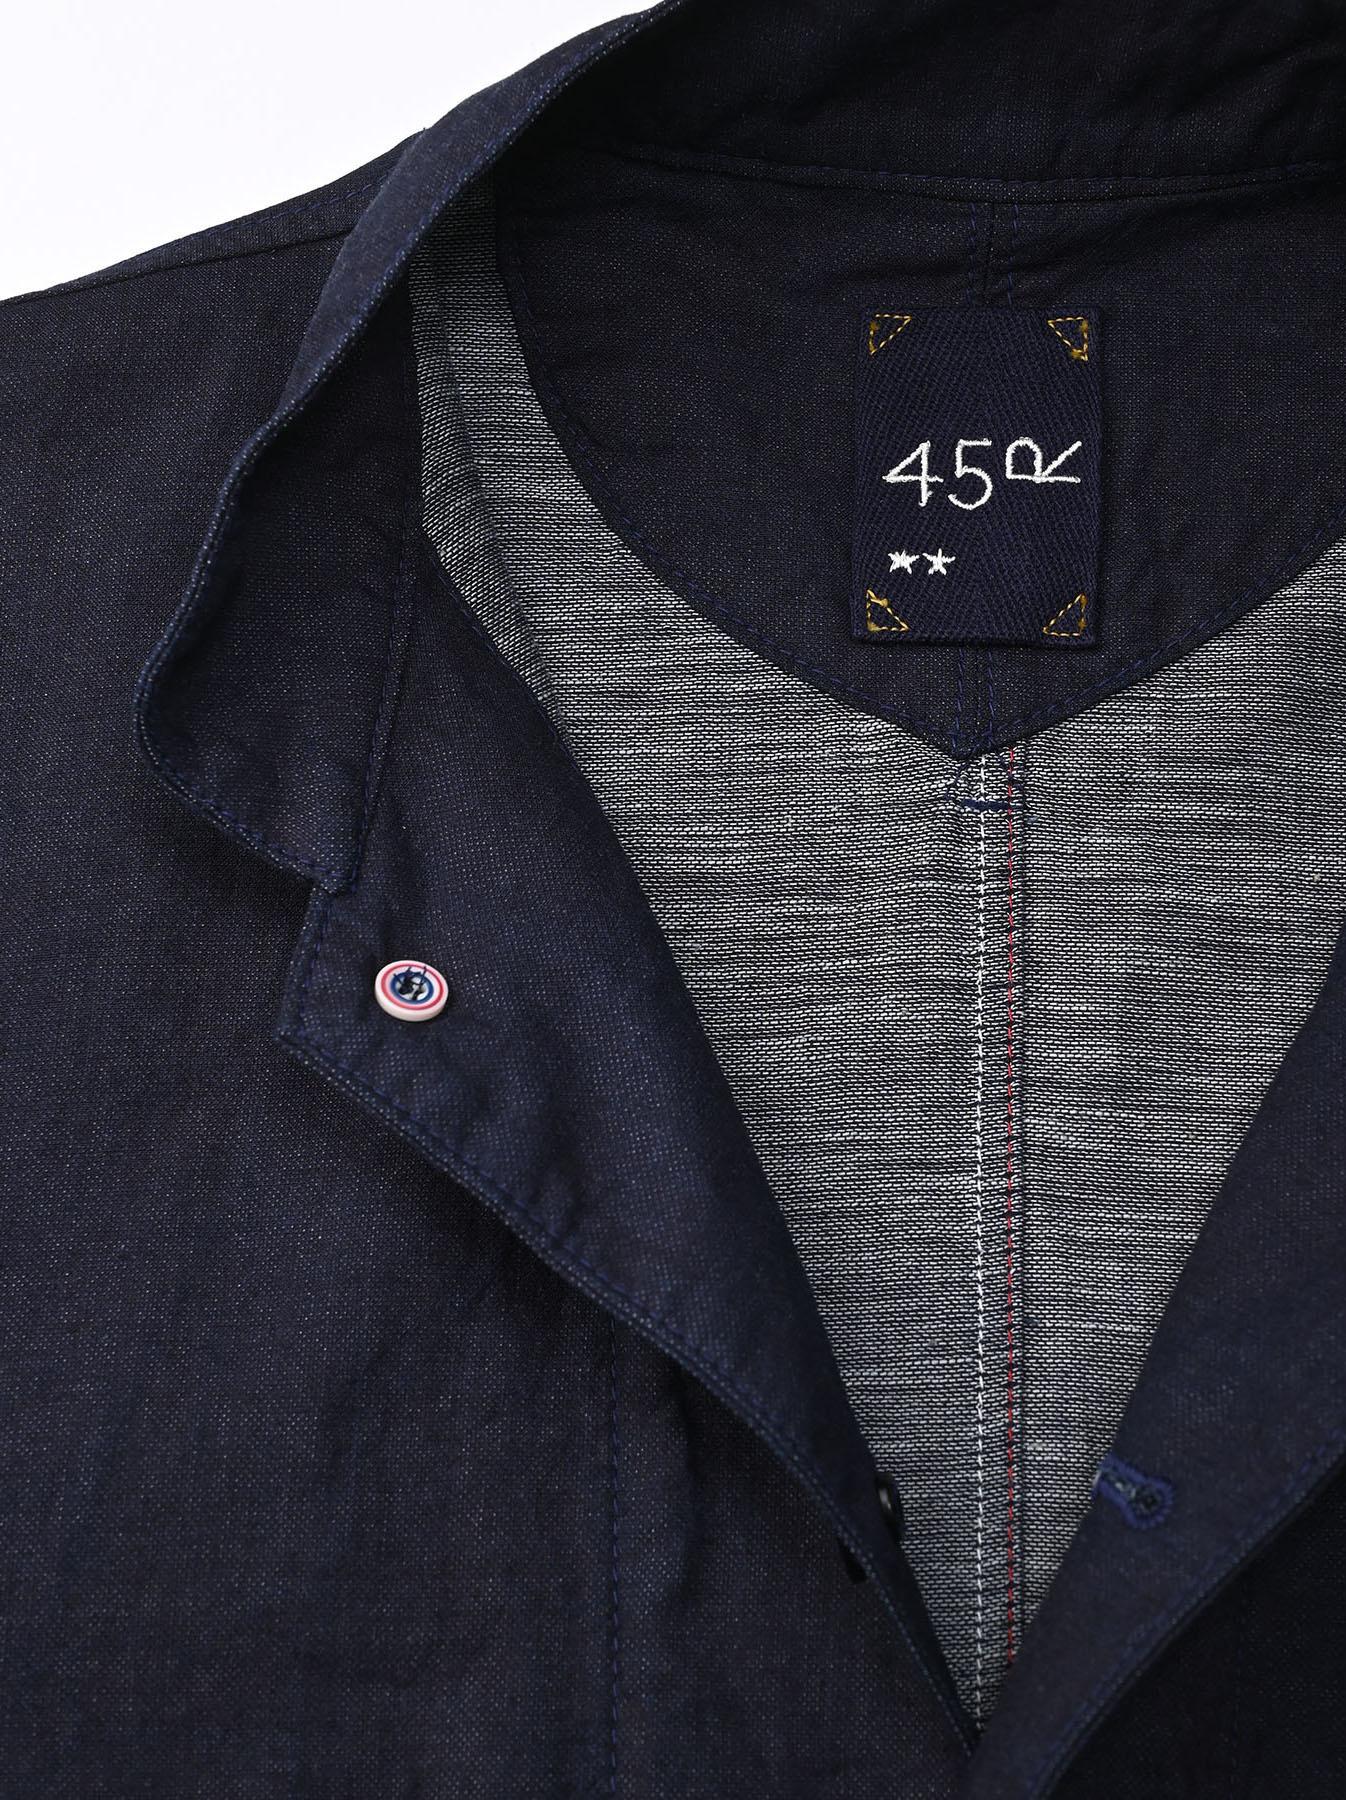 Indigo Double Woven 908 Shirt Jacket (0421)-8